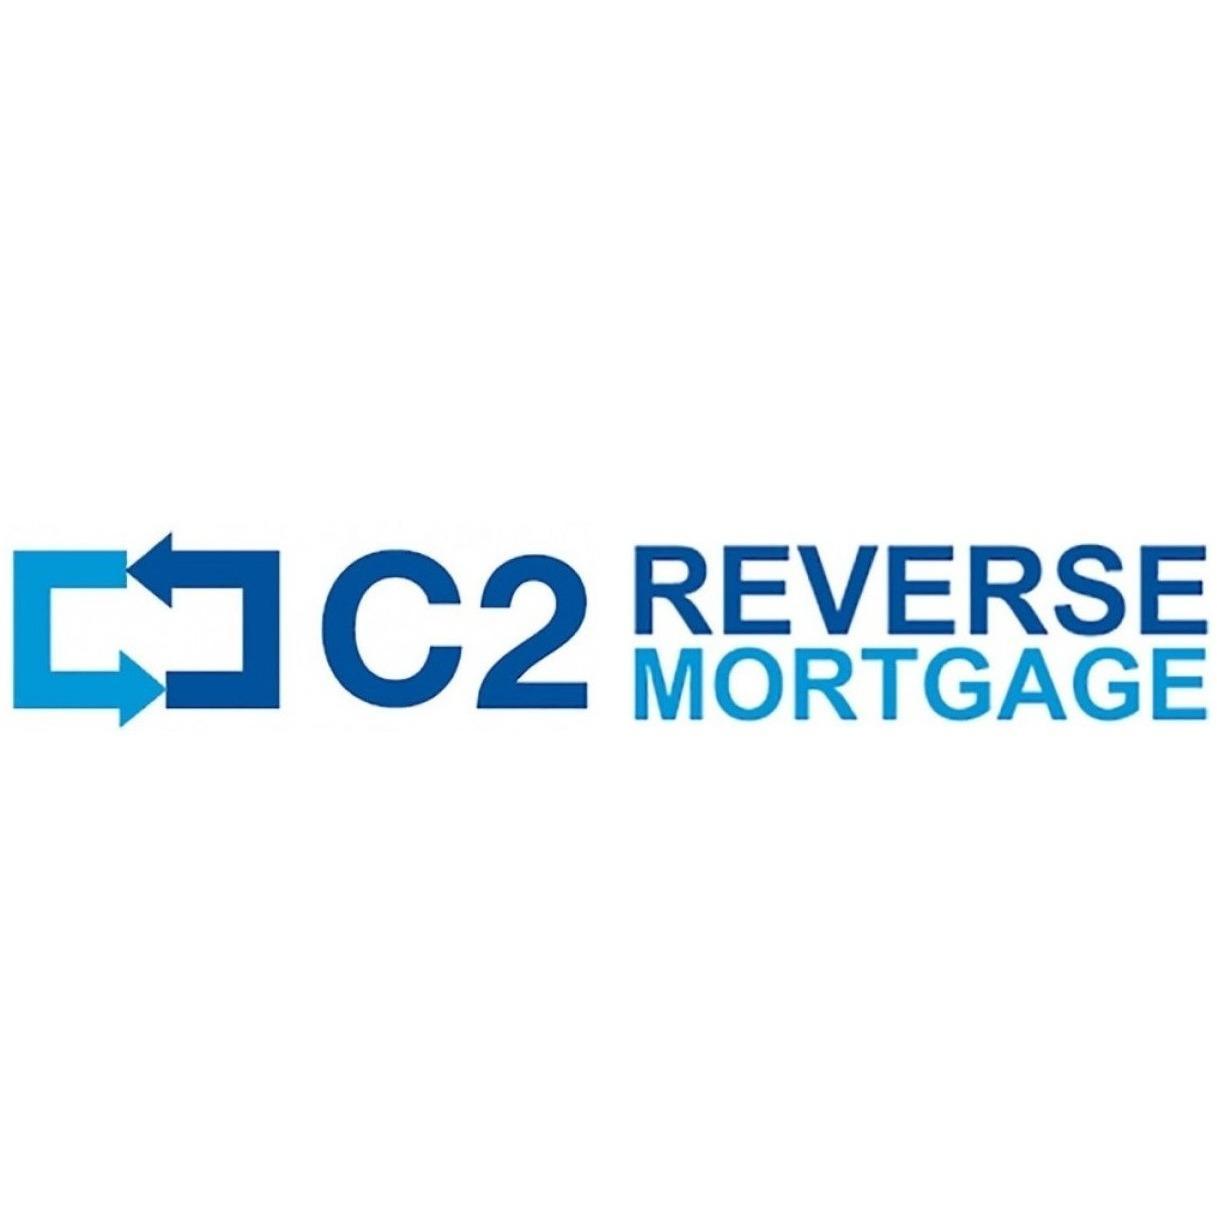 William Oxidine - Reverse Mortgage Professional image 1